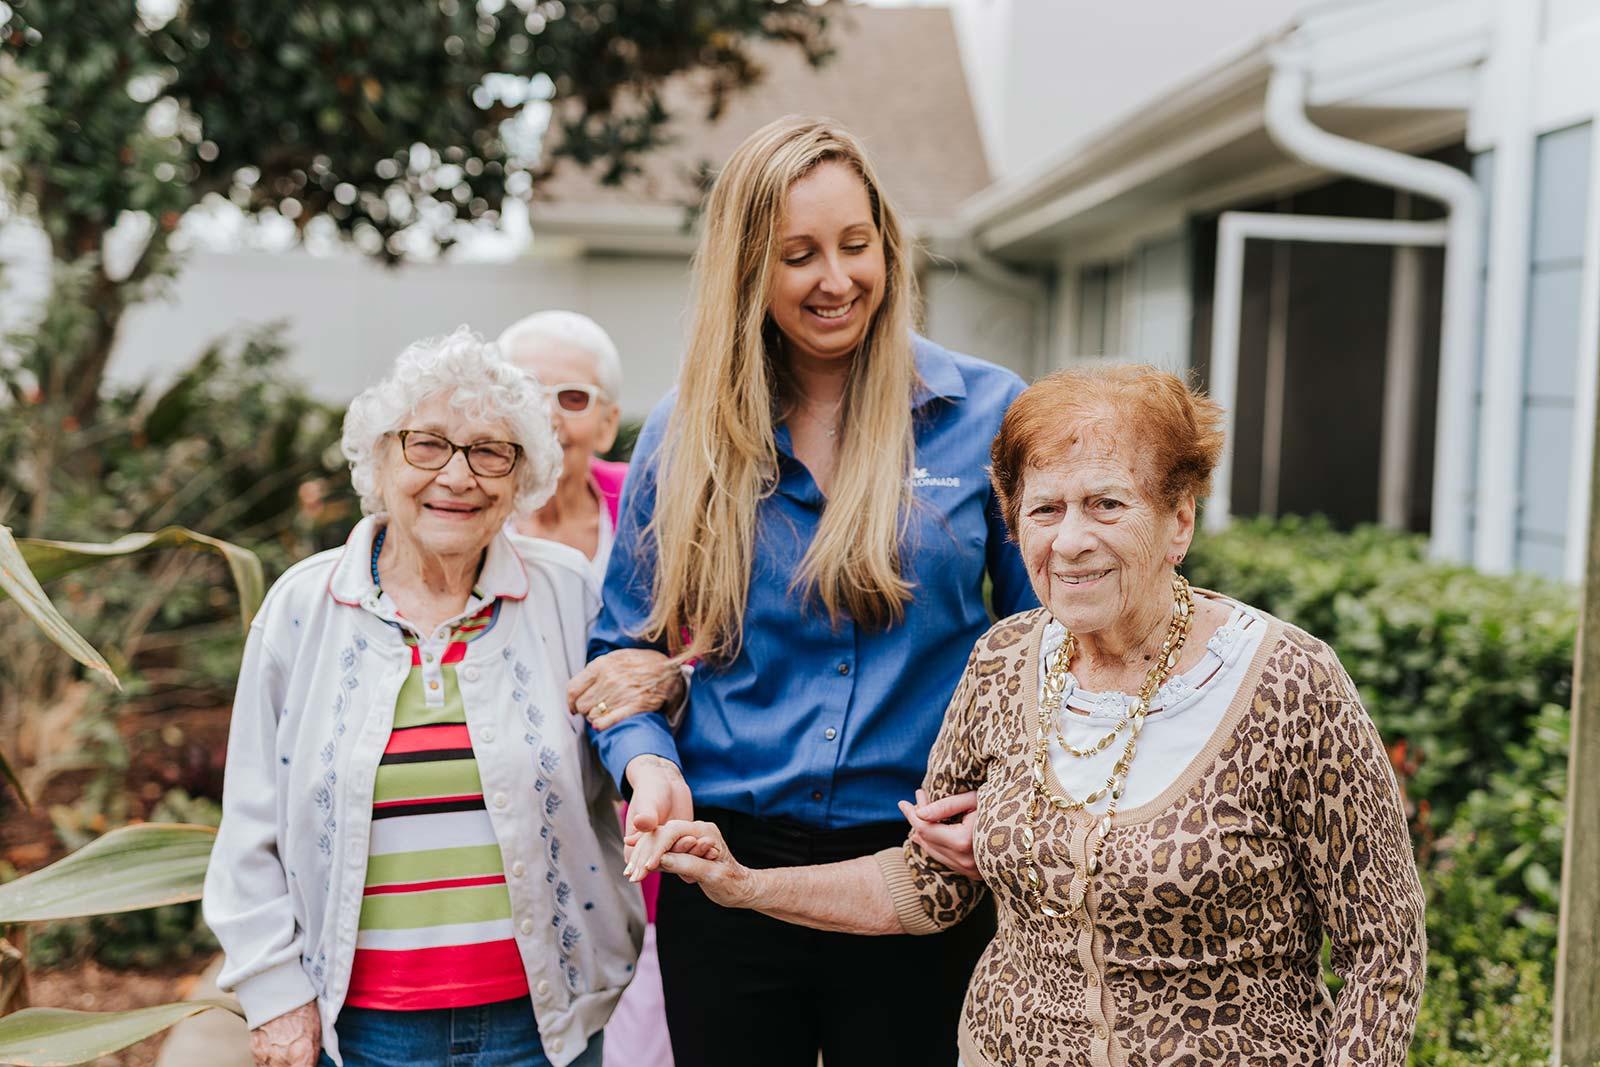 Femal staff member walking with group of senior women holding hands